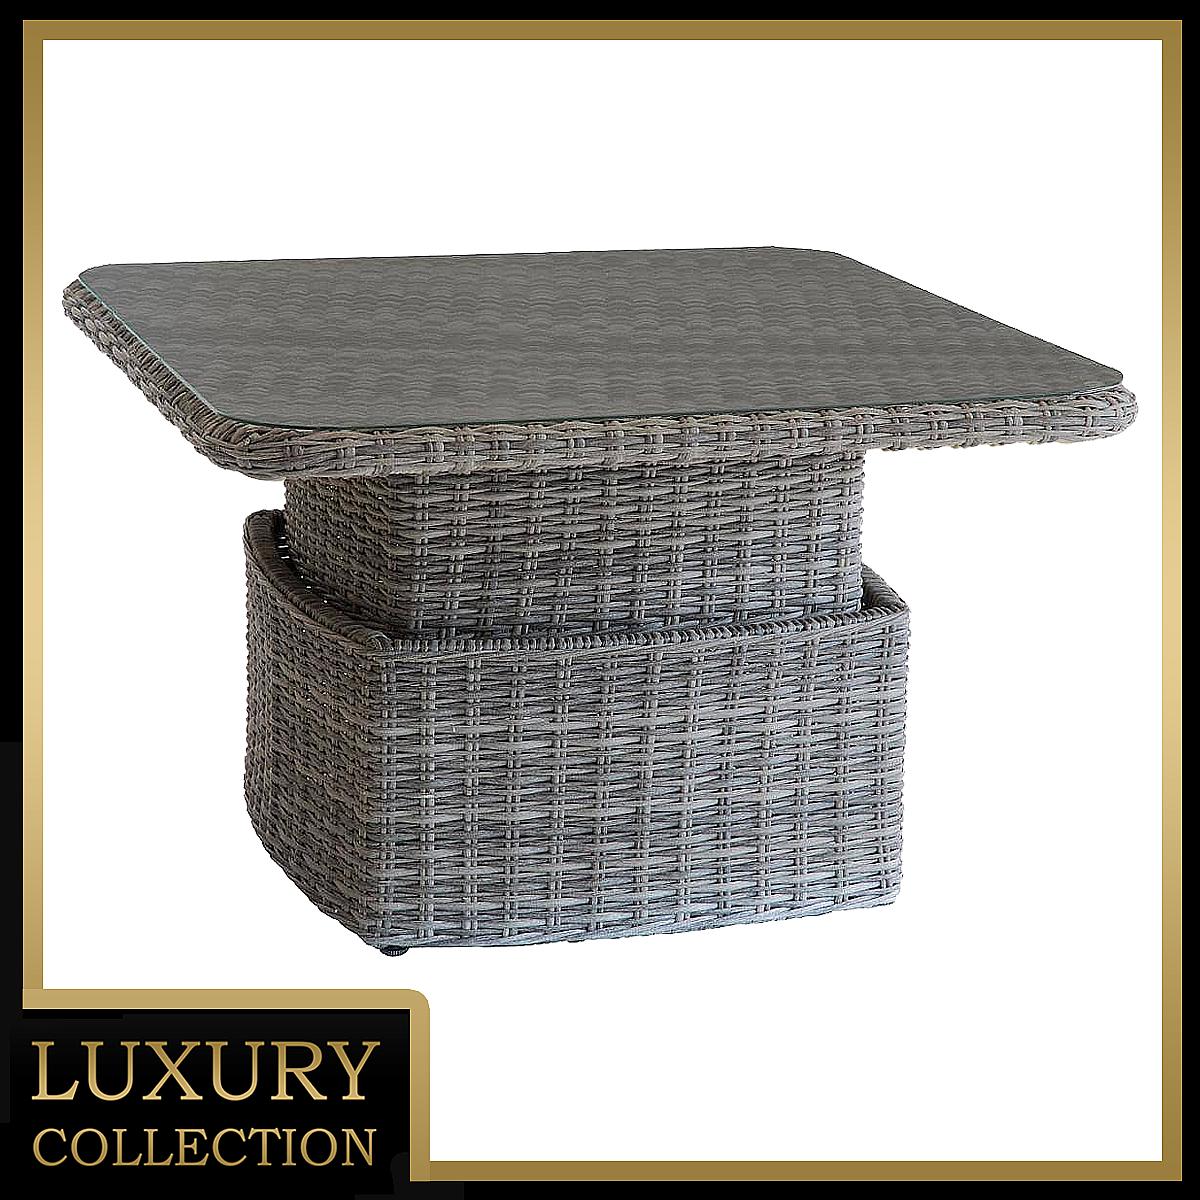 Ratanový stôl výsuvný jedálenský/odkladací 100 x 100 cm BORNEO (sivá)